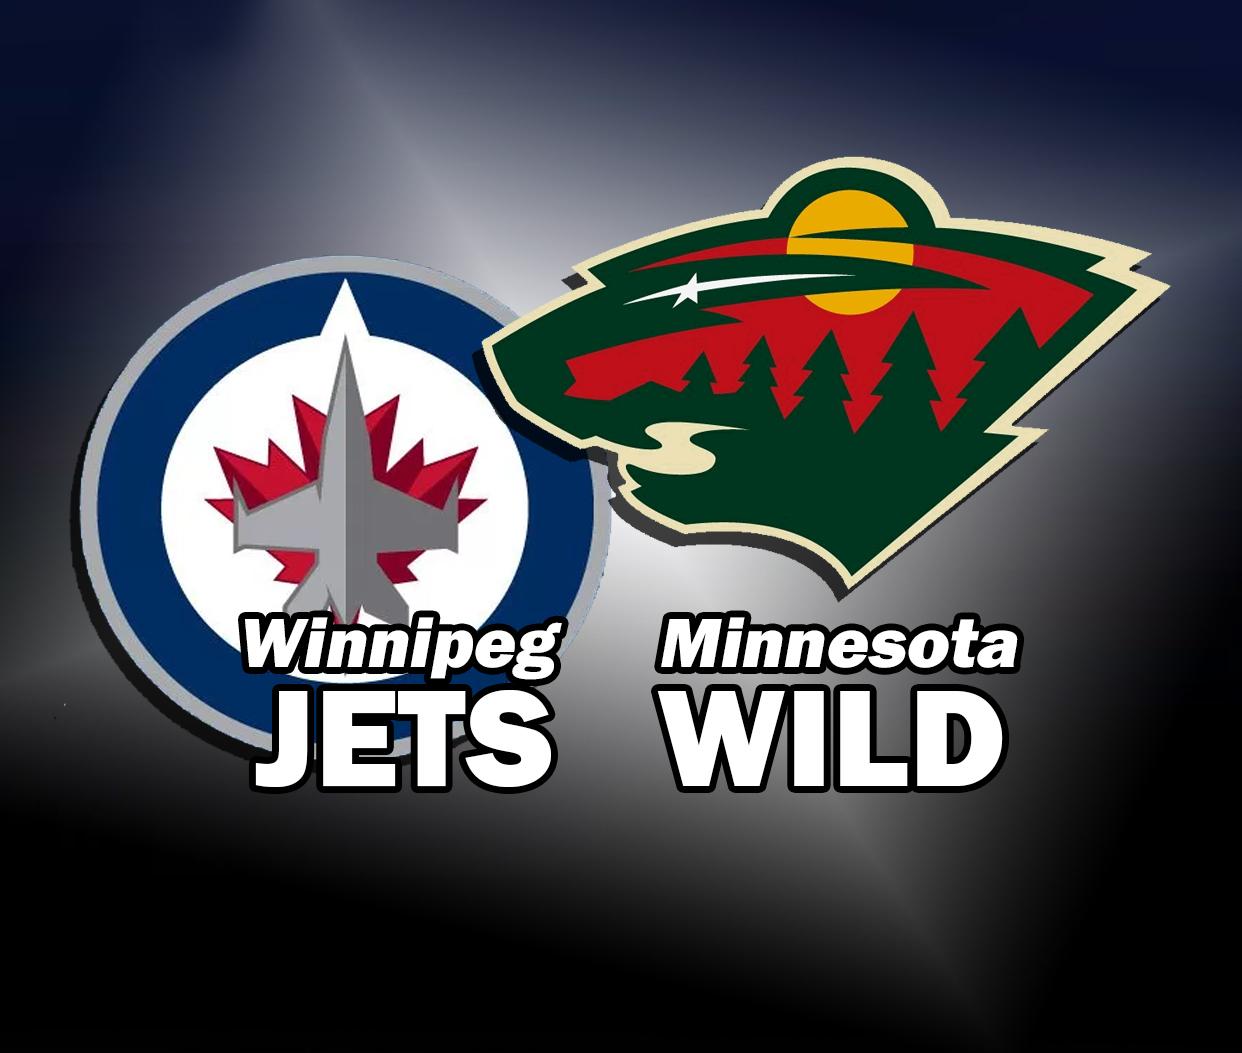 Jets vs Wild match Bus service from Winnipeg to Minnesota